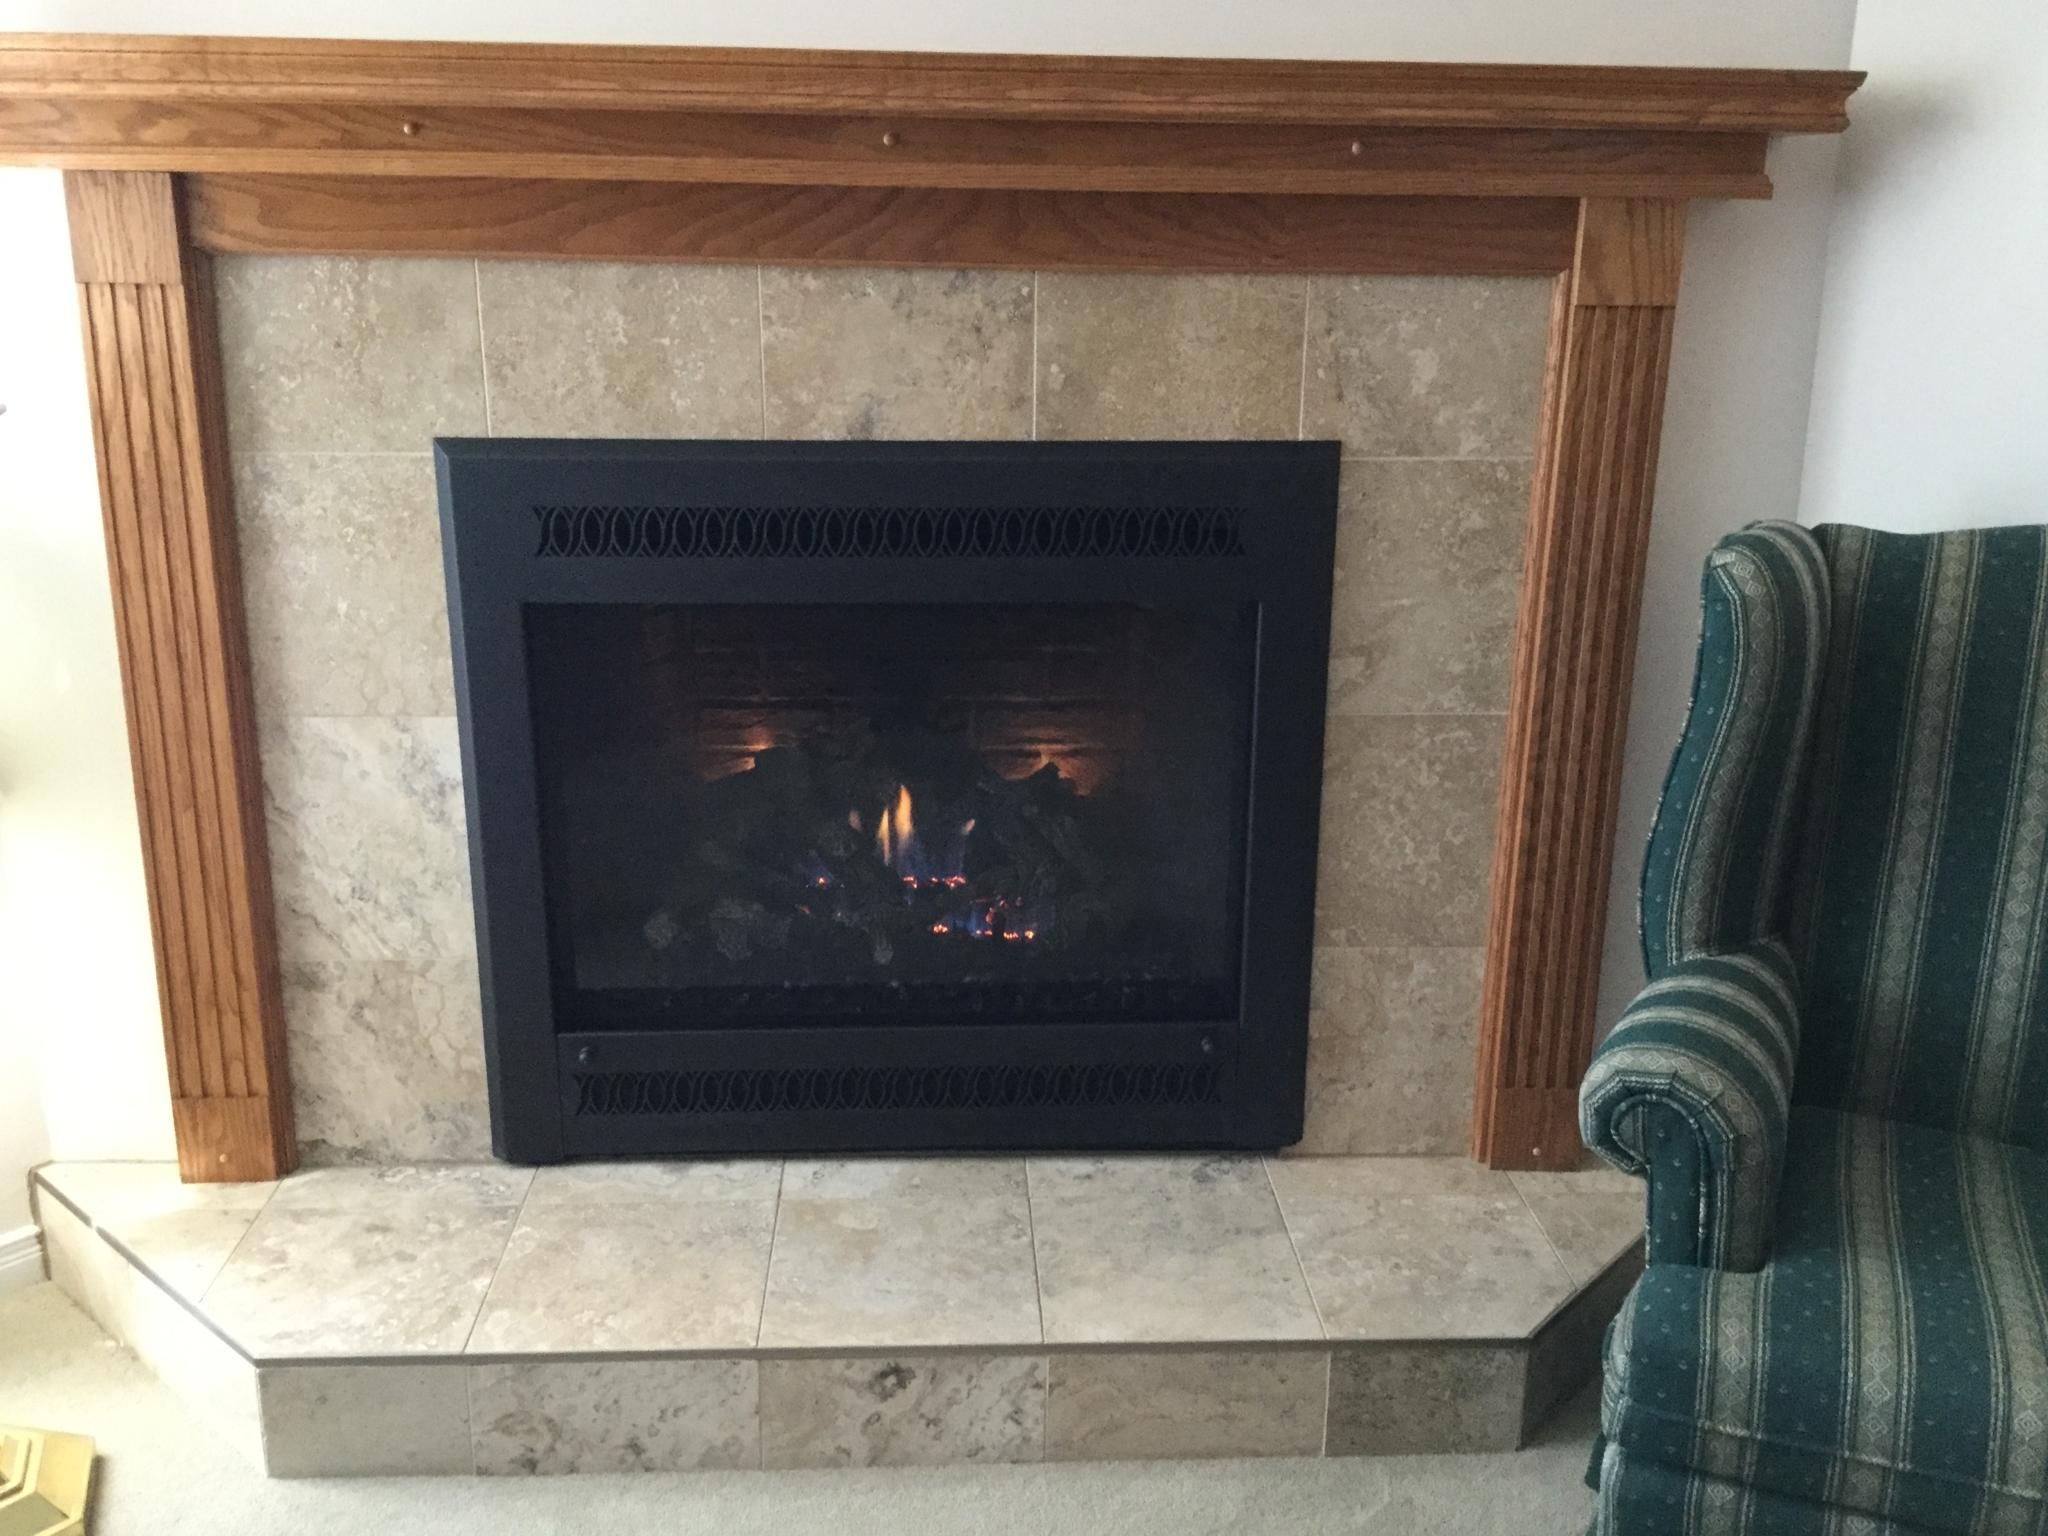 c surround st granite minneapolis paul one unlimited piece surrounds fireplaces fireplace d